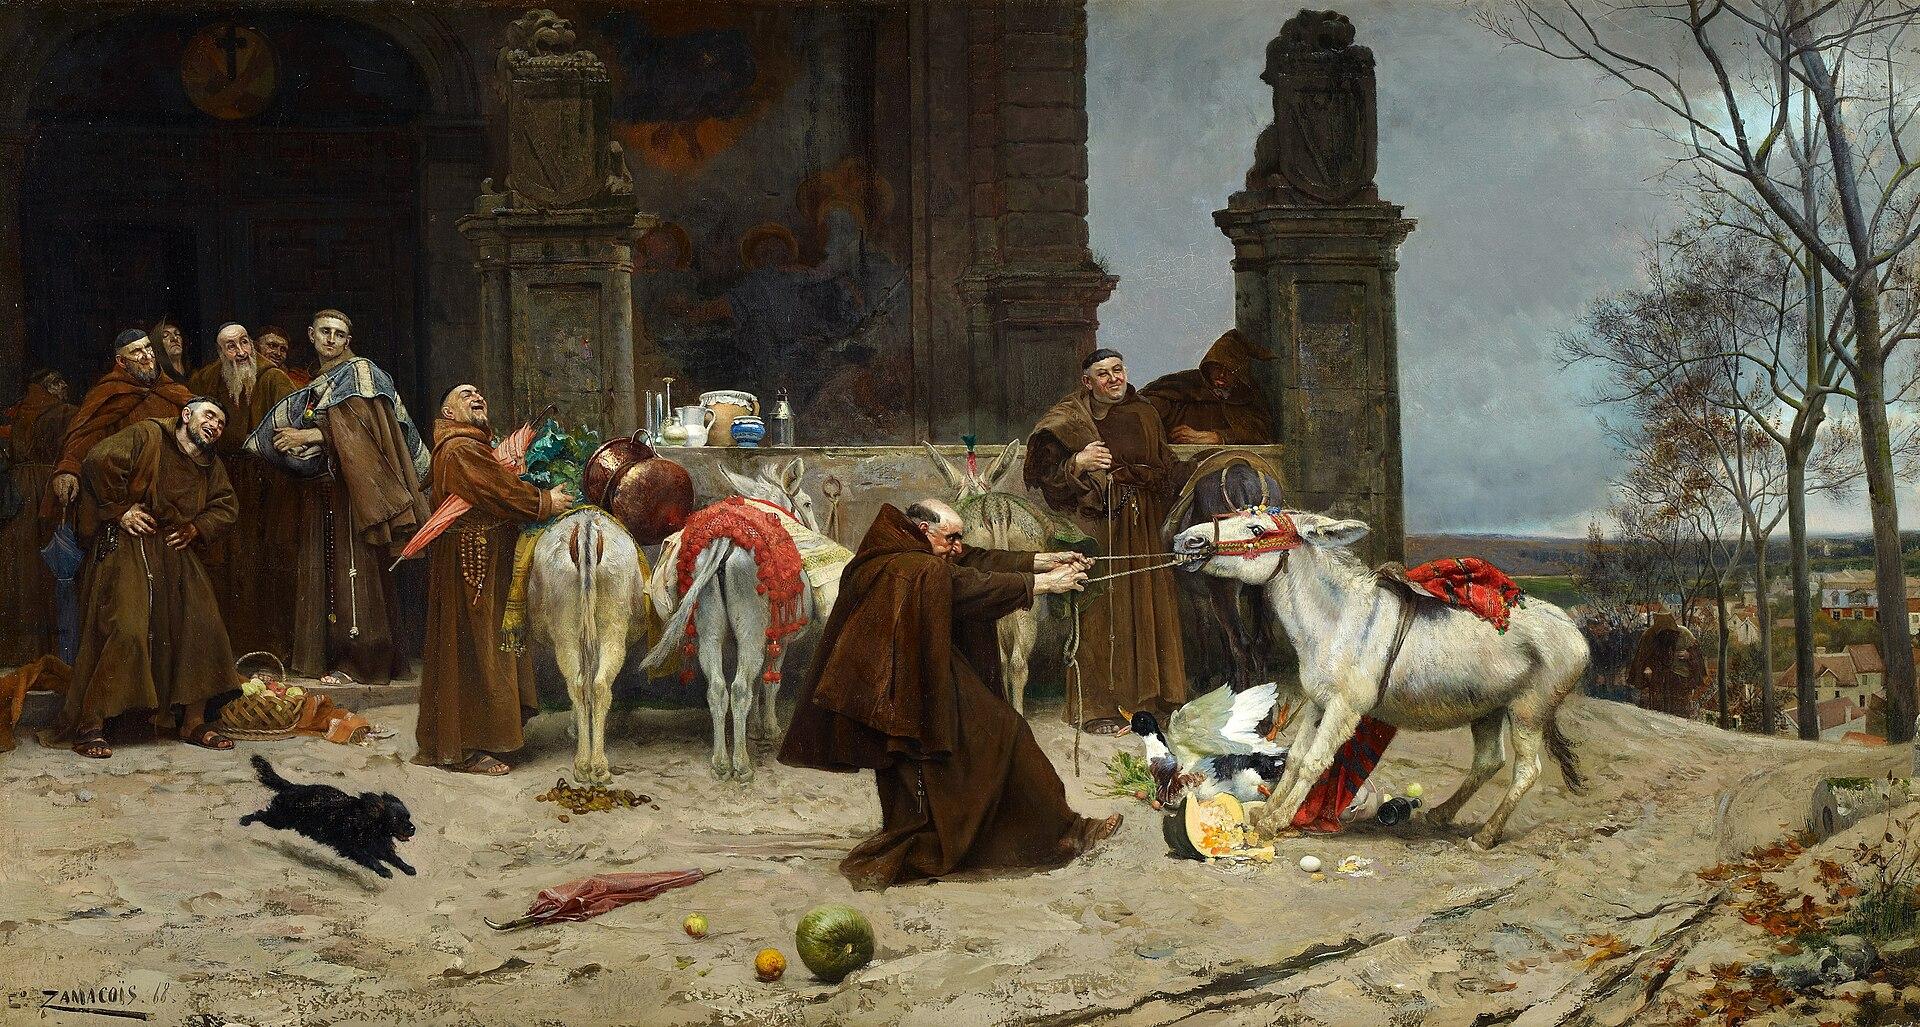 ЭДУАРДО ЗАМАКУА-И-ЗАБАЛА - Regreso al Convento (Музей Кармен Тиссен, Малага, 1868 г. Óleo sobre lienzo, 54,5 x 100,5 см) .jpg